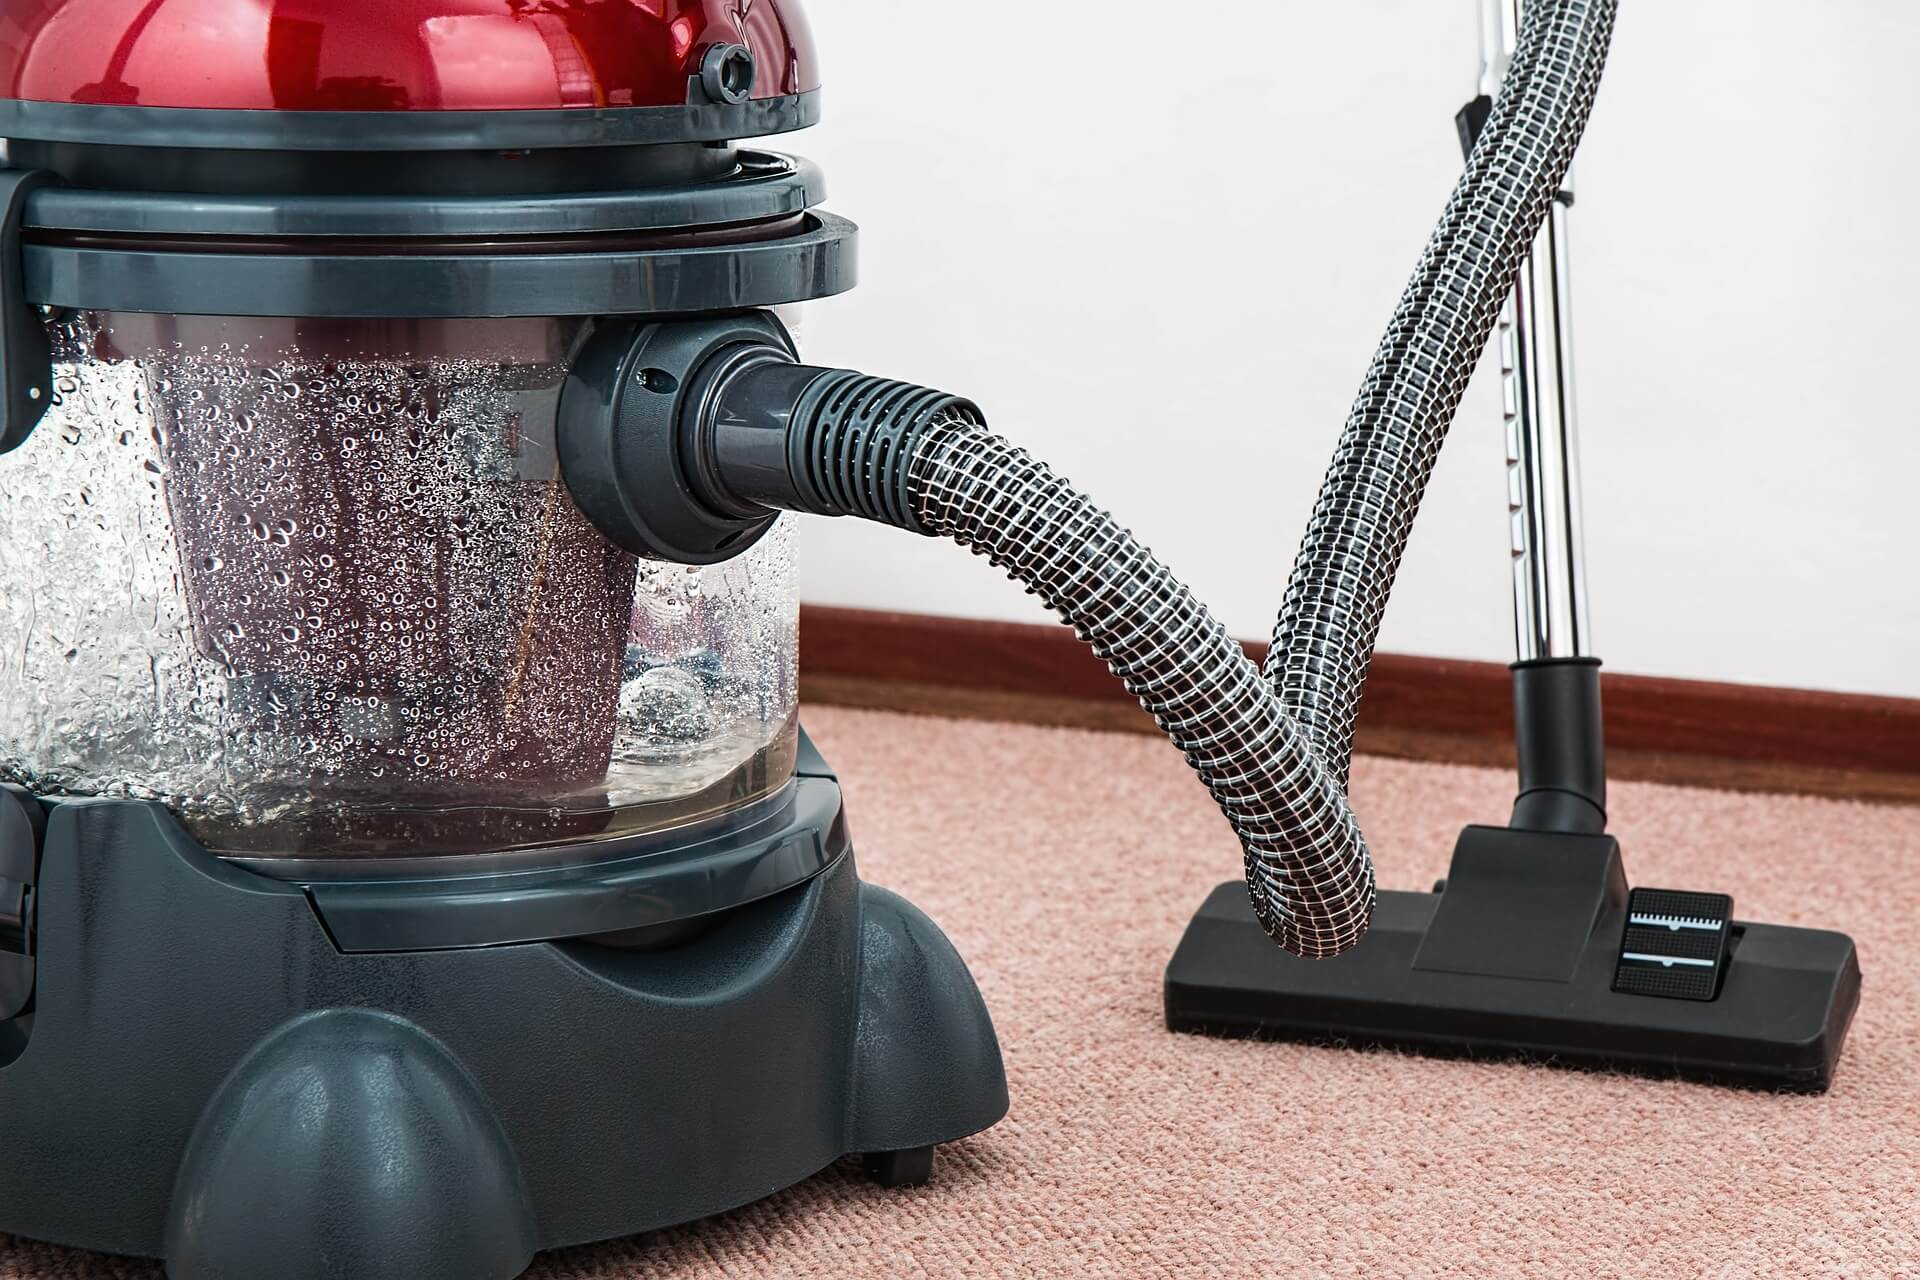 Cum alegi aspiratorul potrivit pentru casa ta